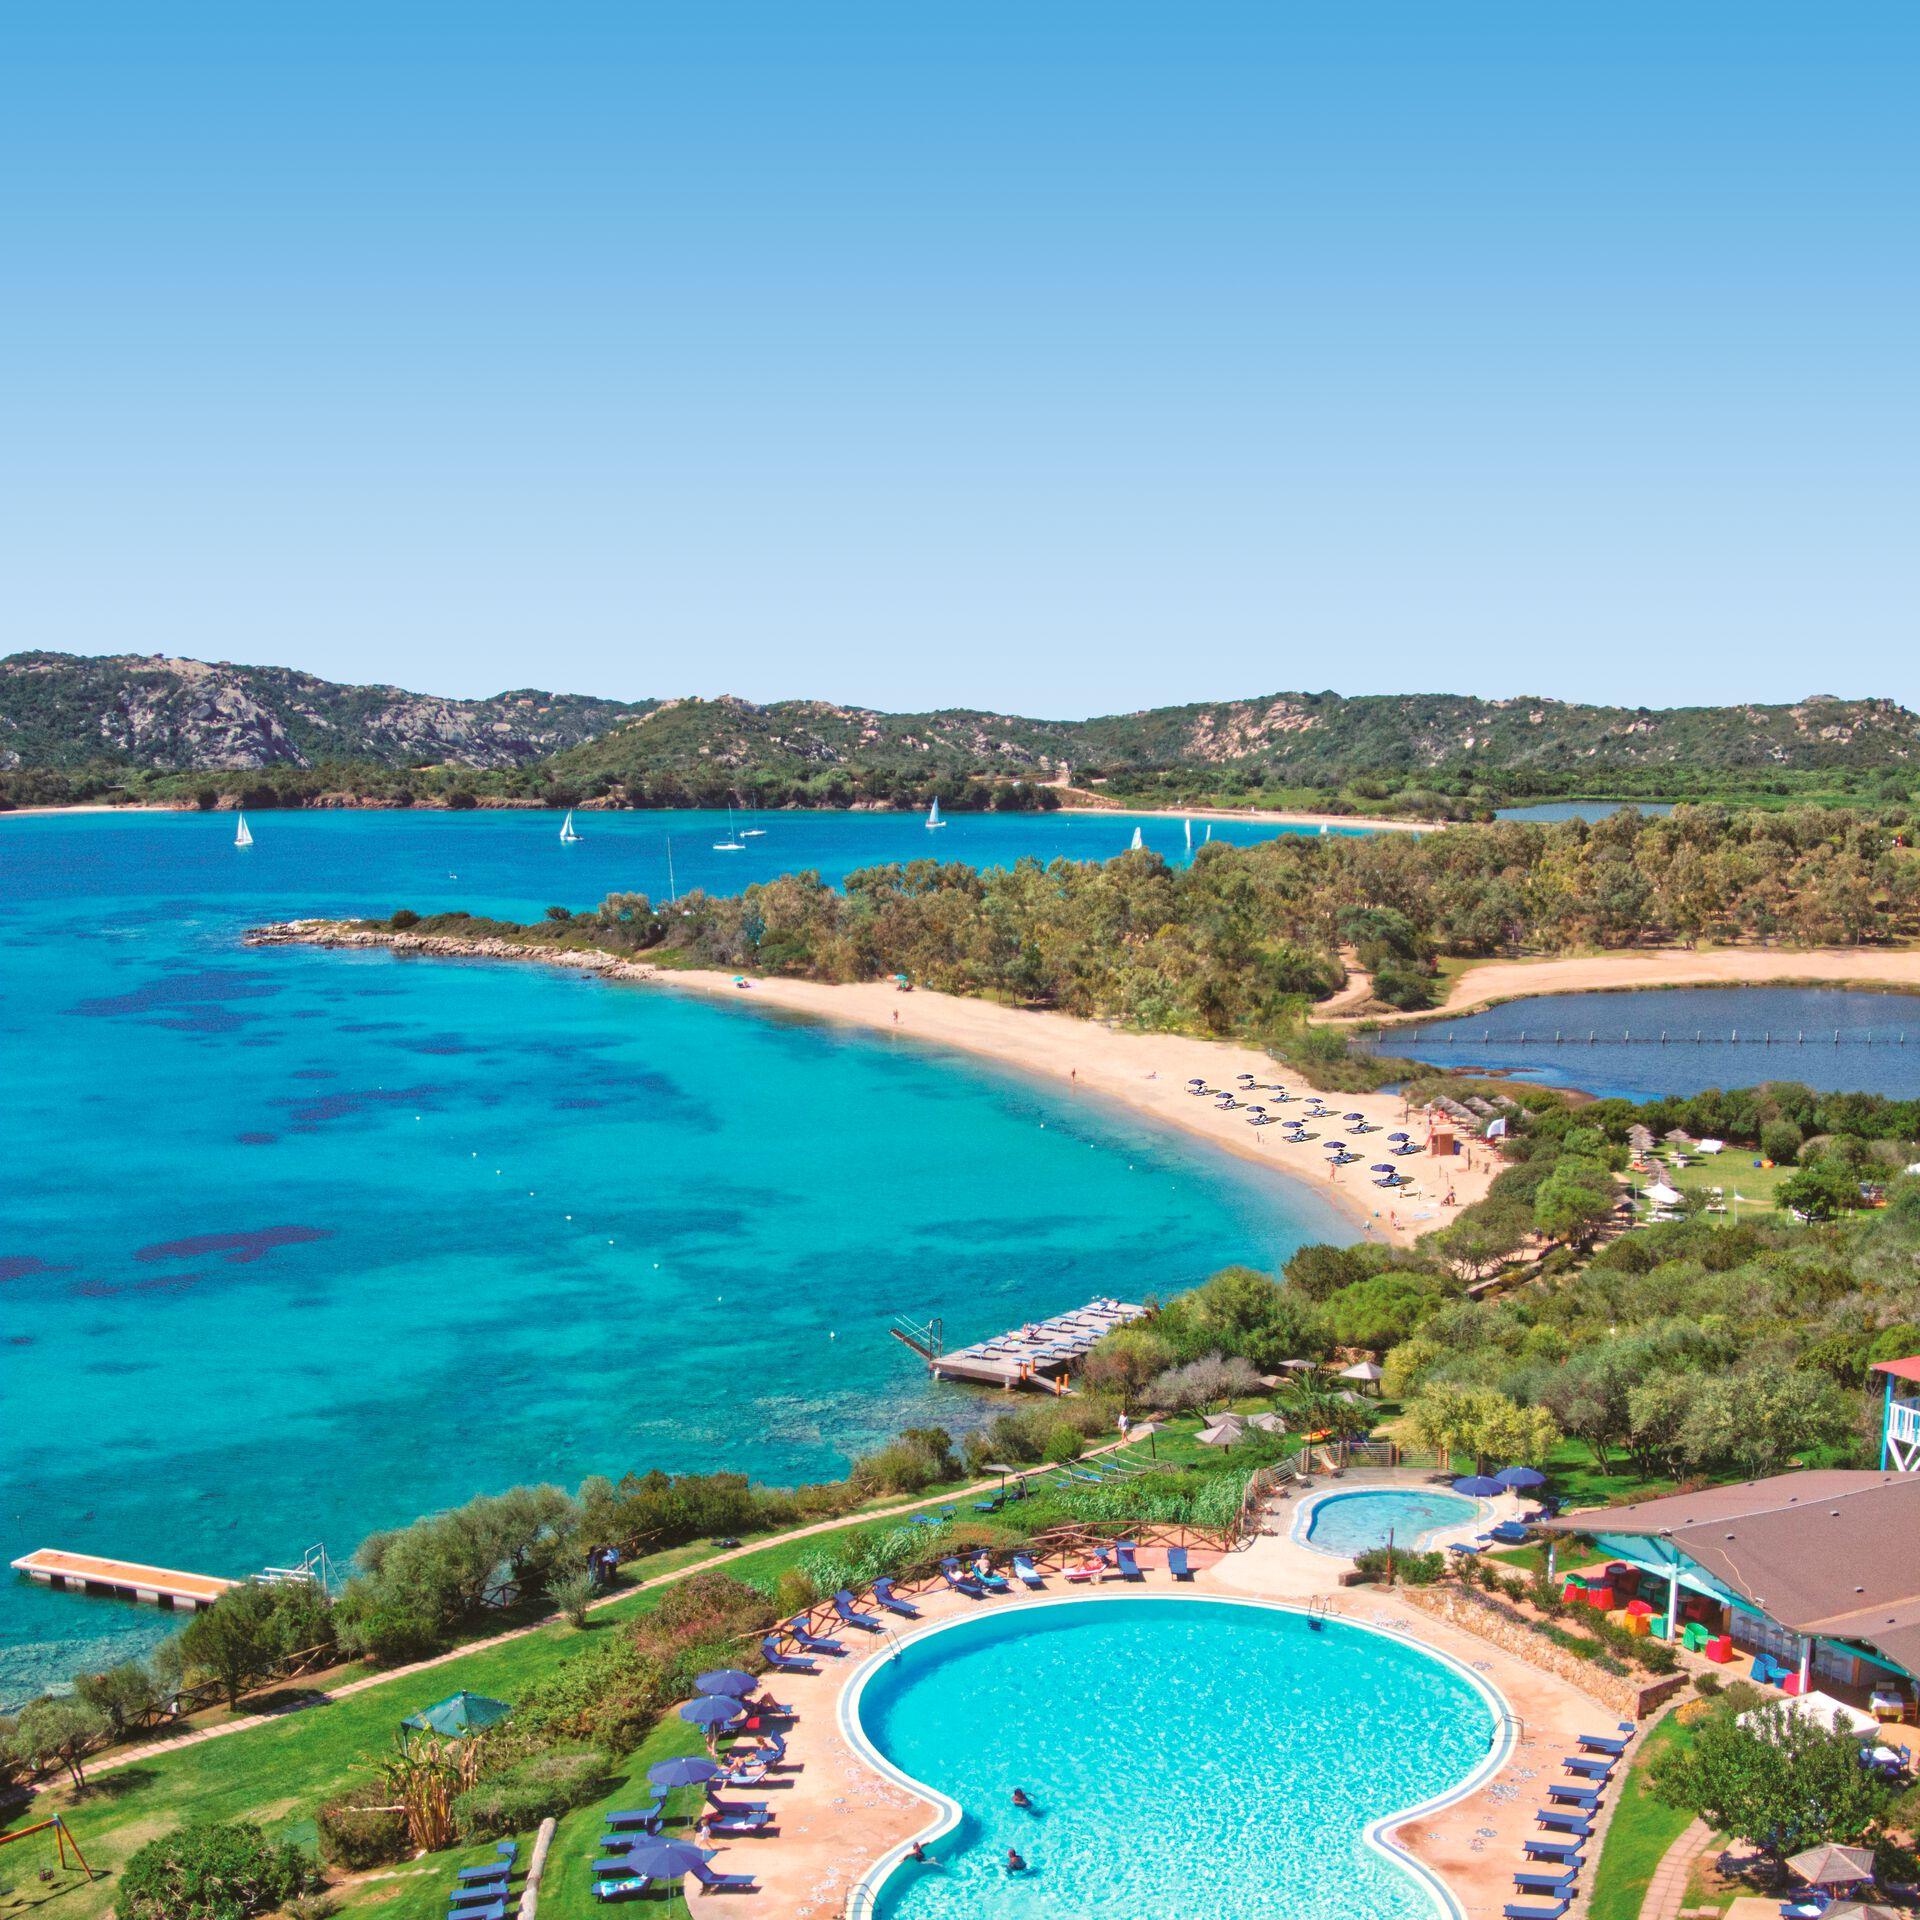 Séjour Olbia - Park Hotel & SPA Cala di Lepre - 4*